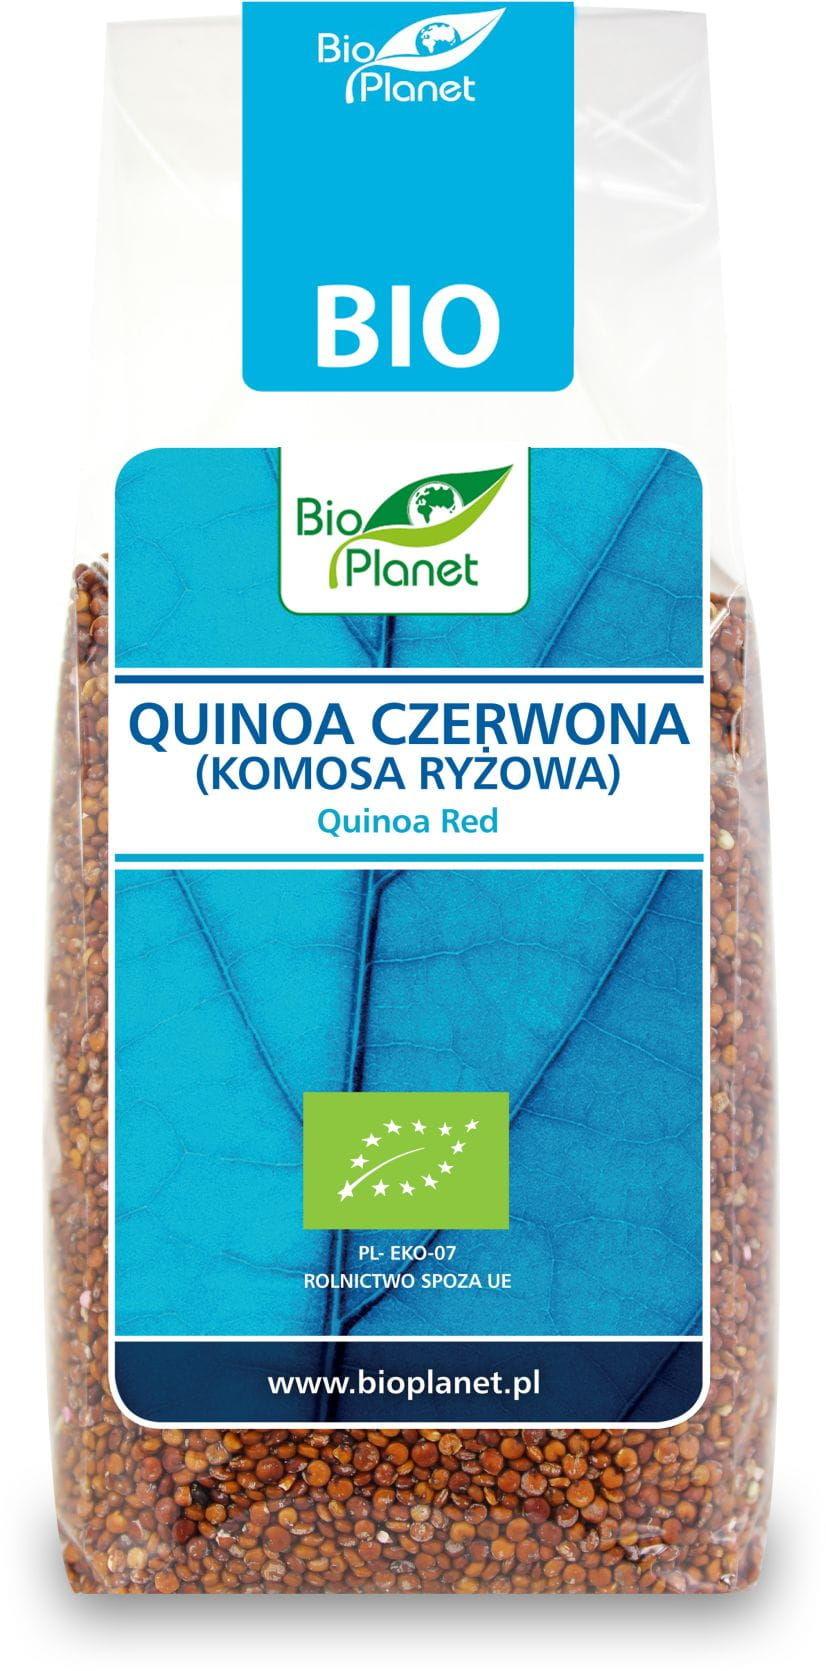 Quinoa Czerwona - Komosa Ryżowa BIO 250g - Bio Planet